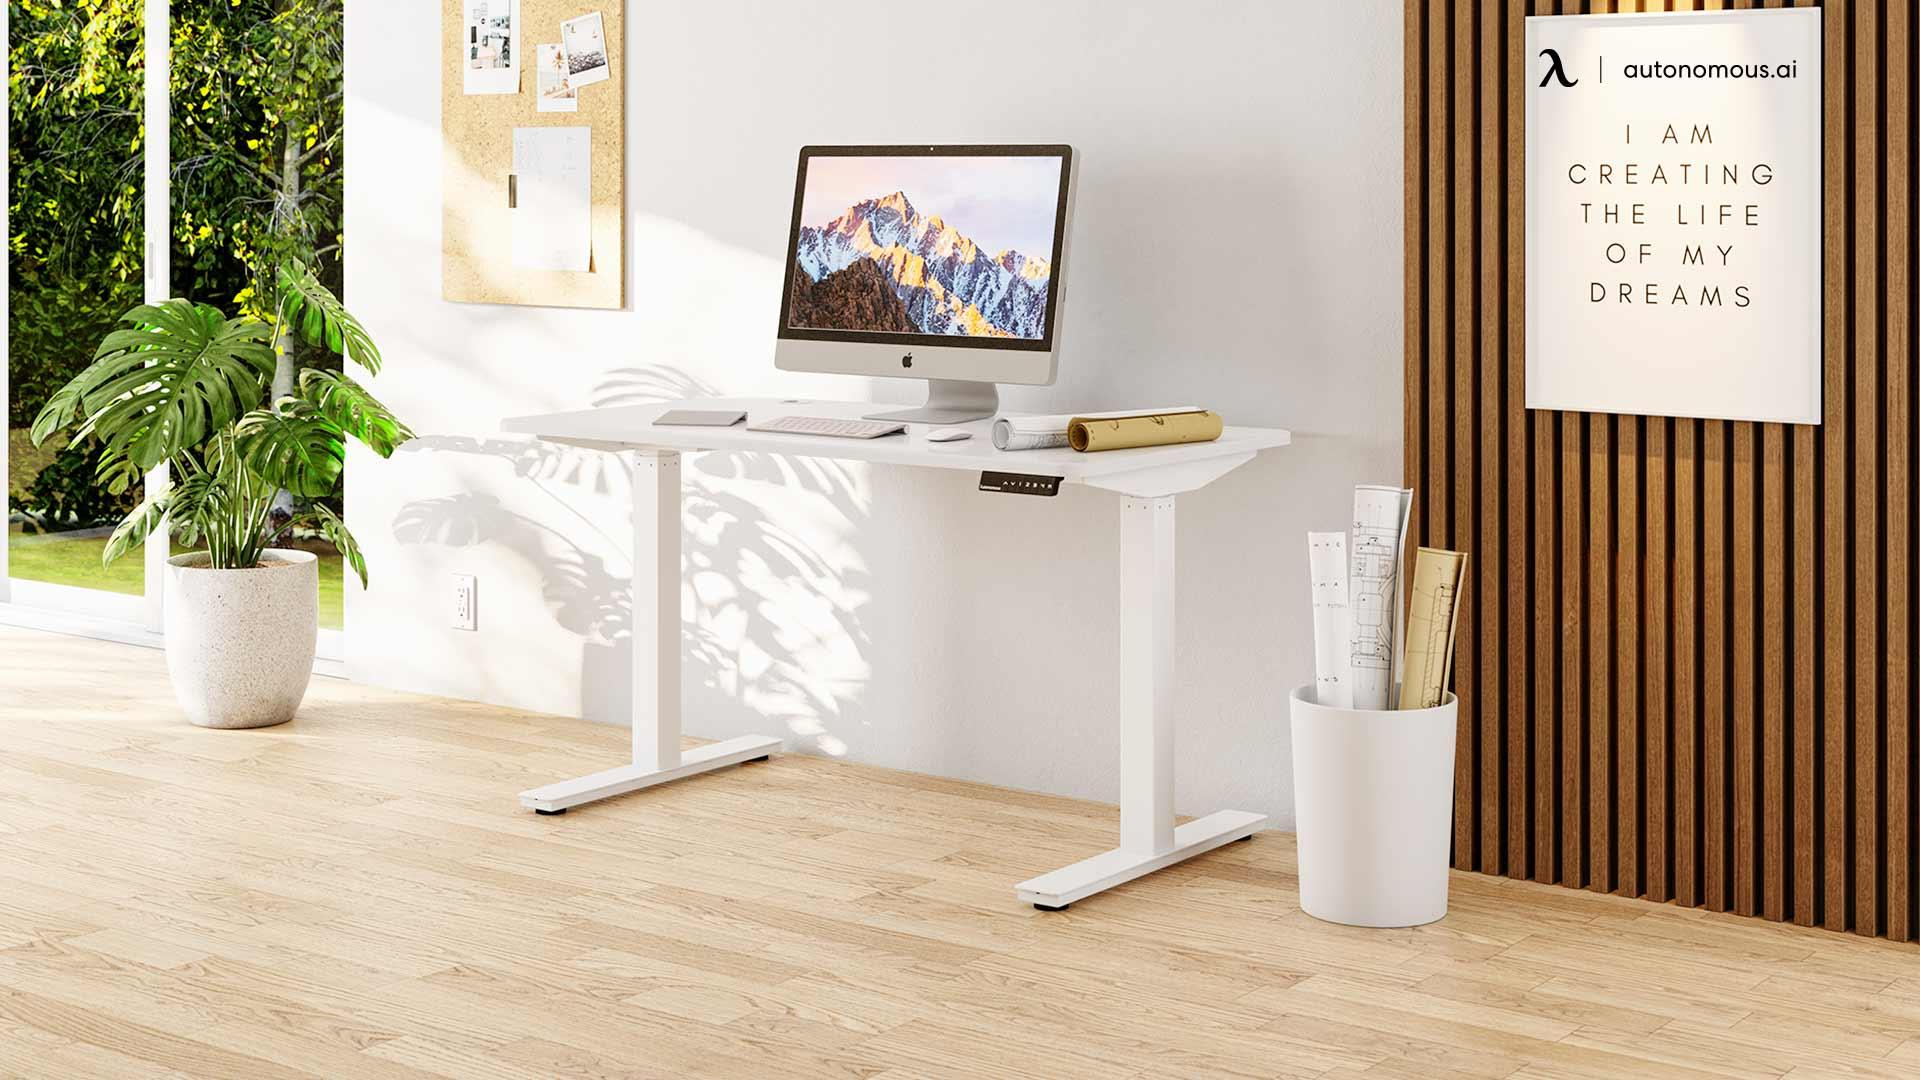 Pick a Work Desk for ergonomic office setup